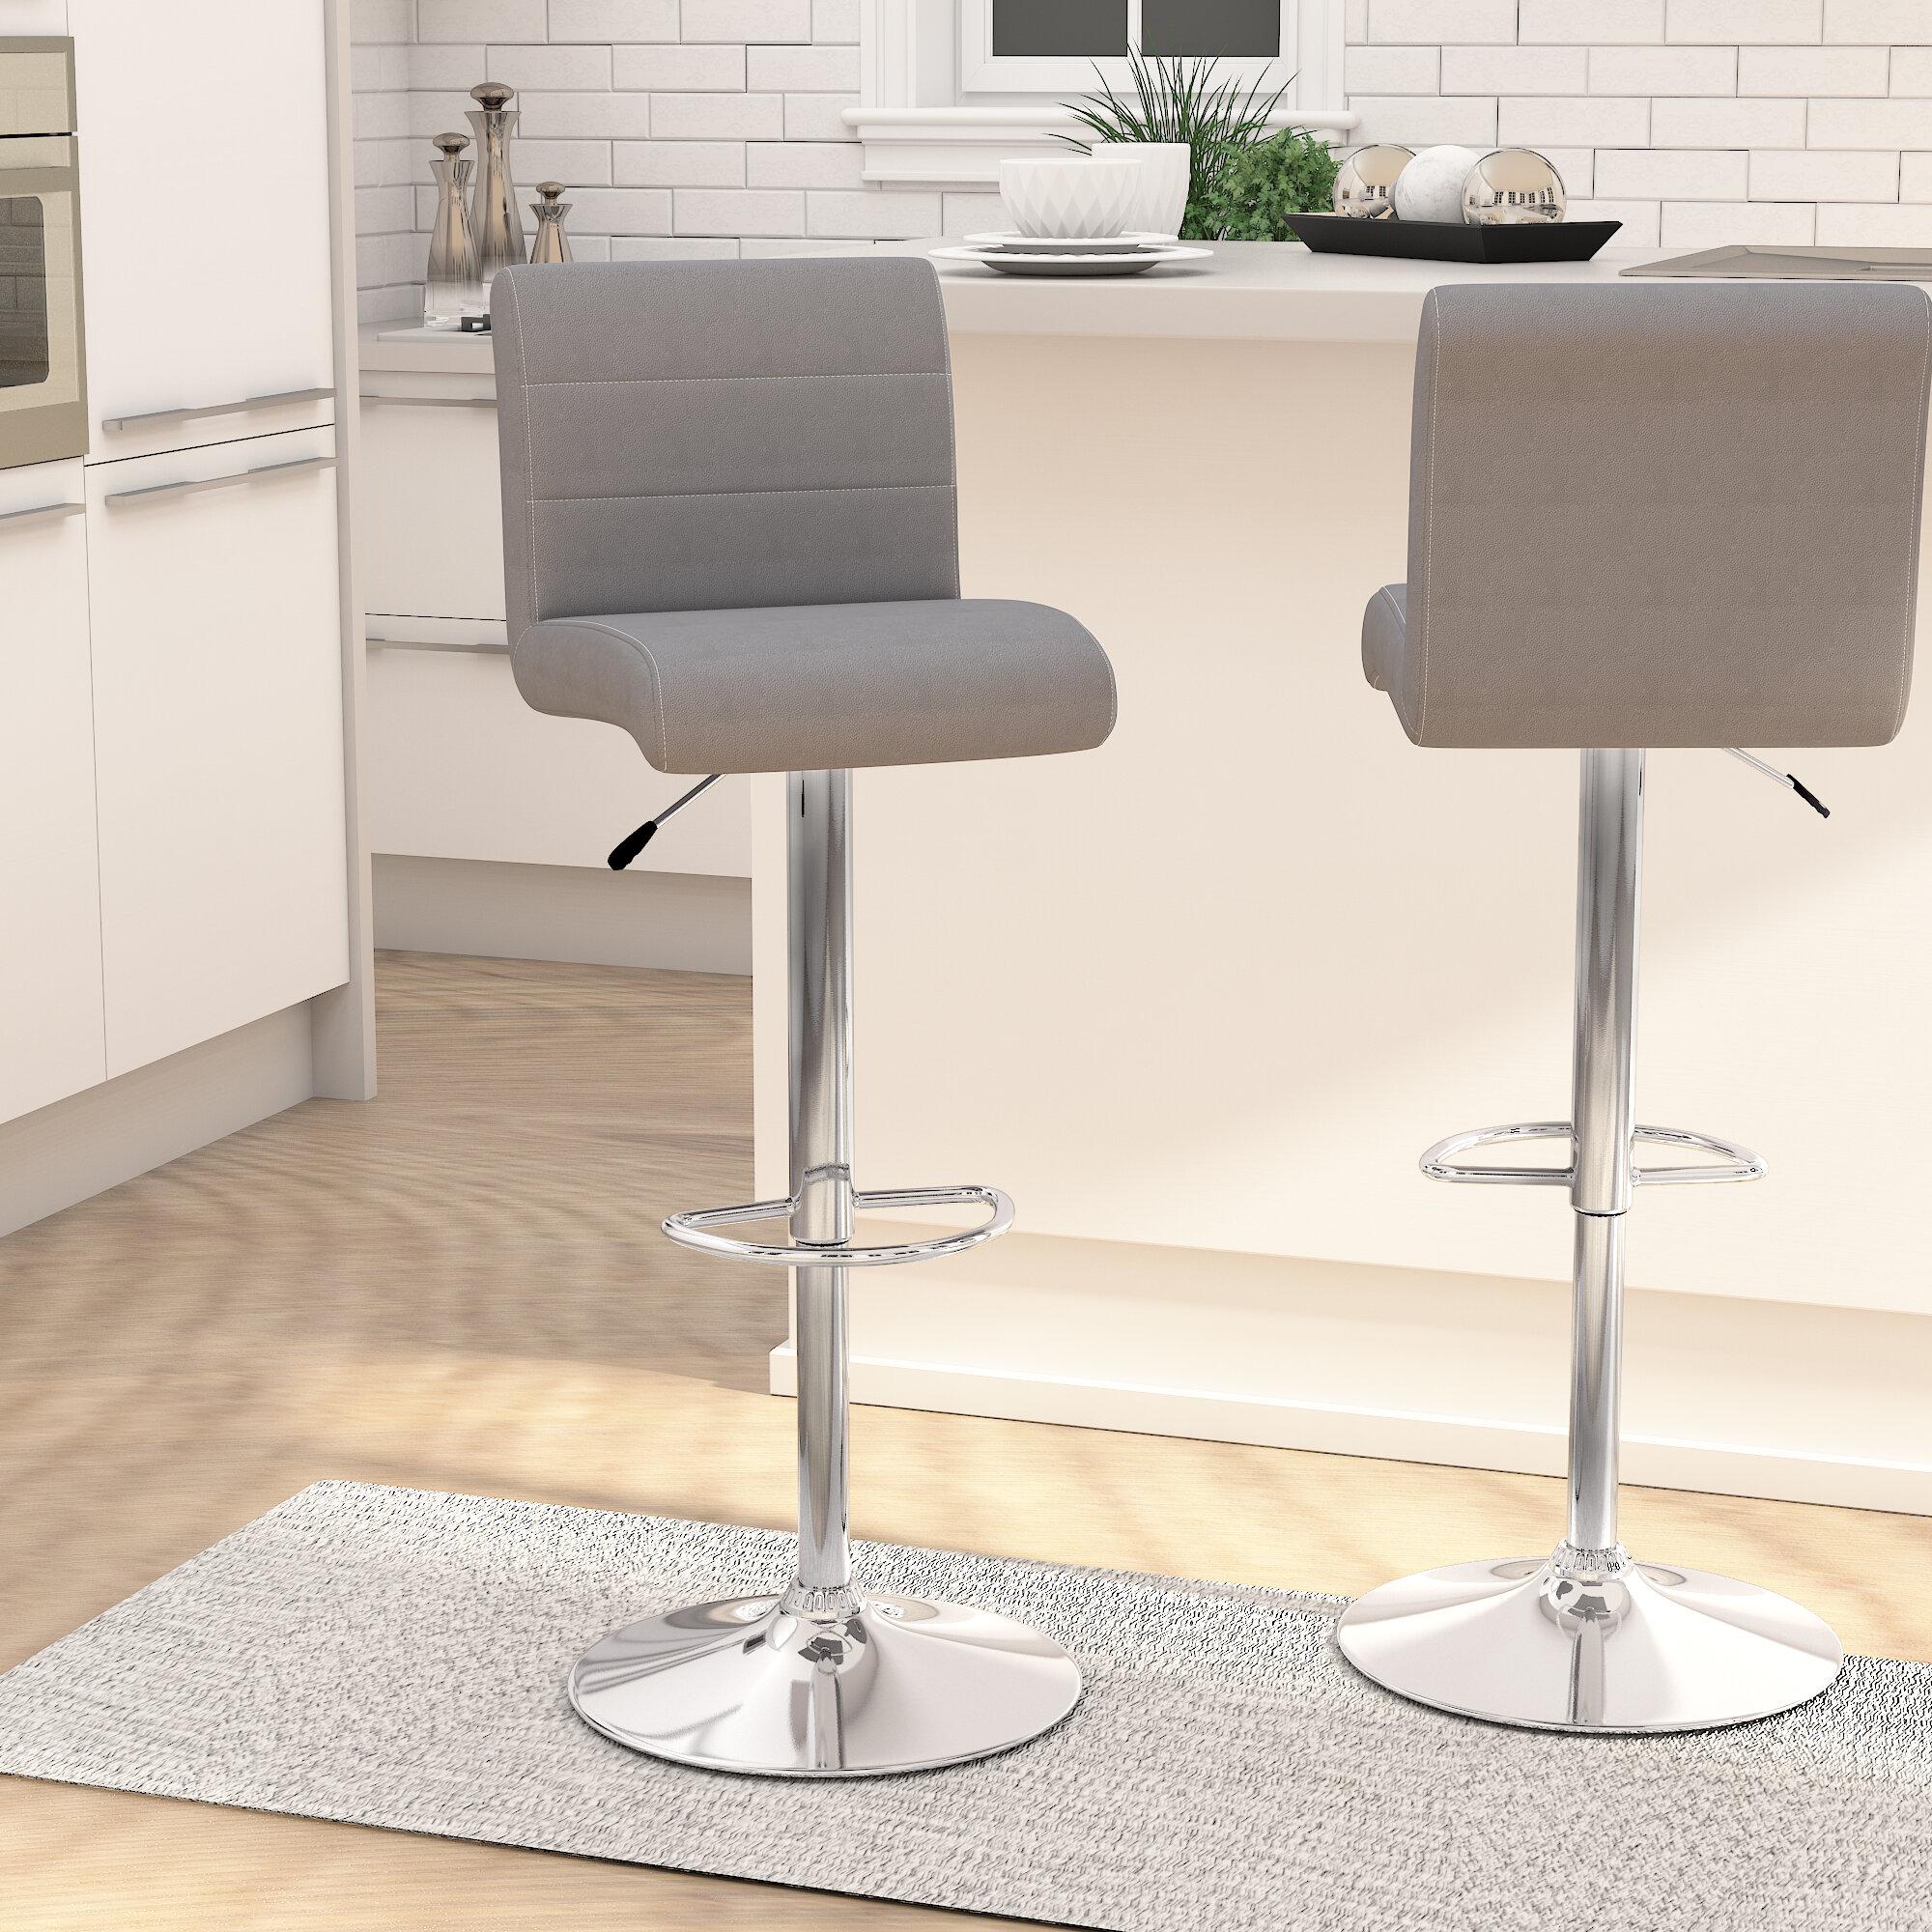 Swell Nusbaum Adjustable Height Swivel Bar Stool Creativecarmelina Interior Chair Design Creativecarmelinacom